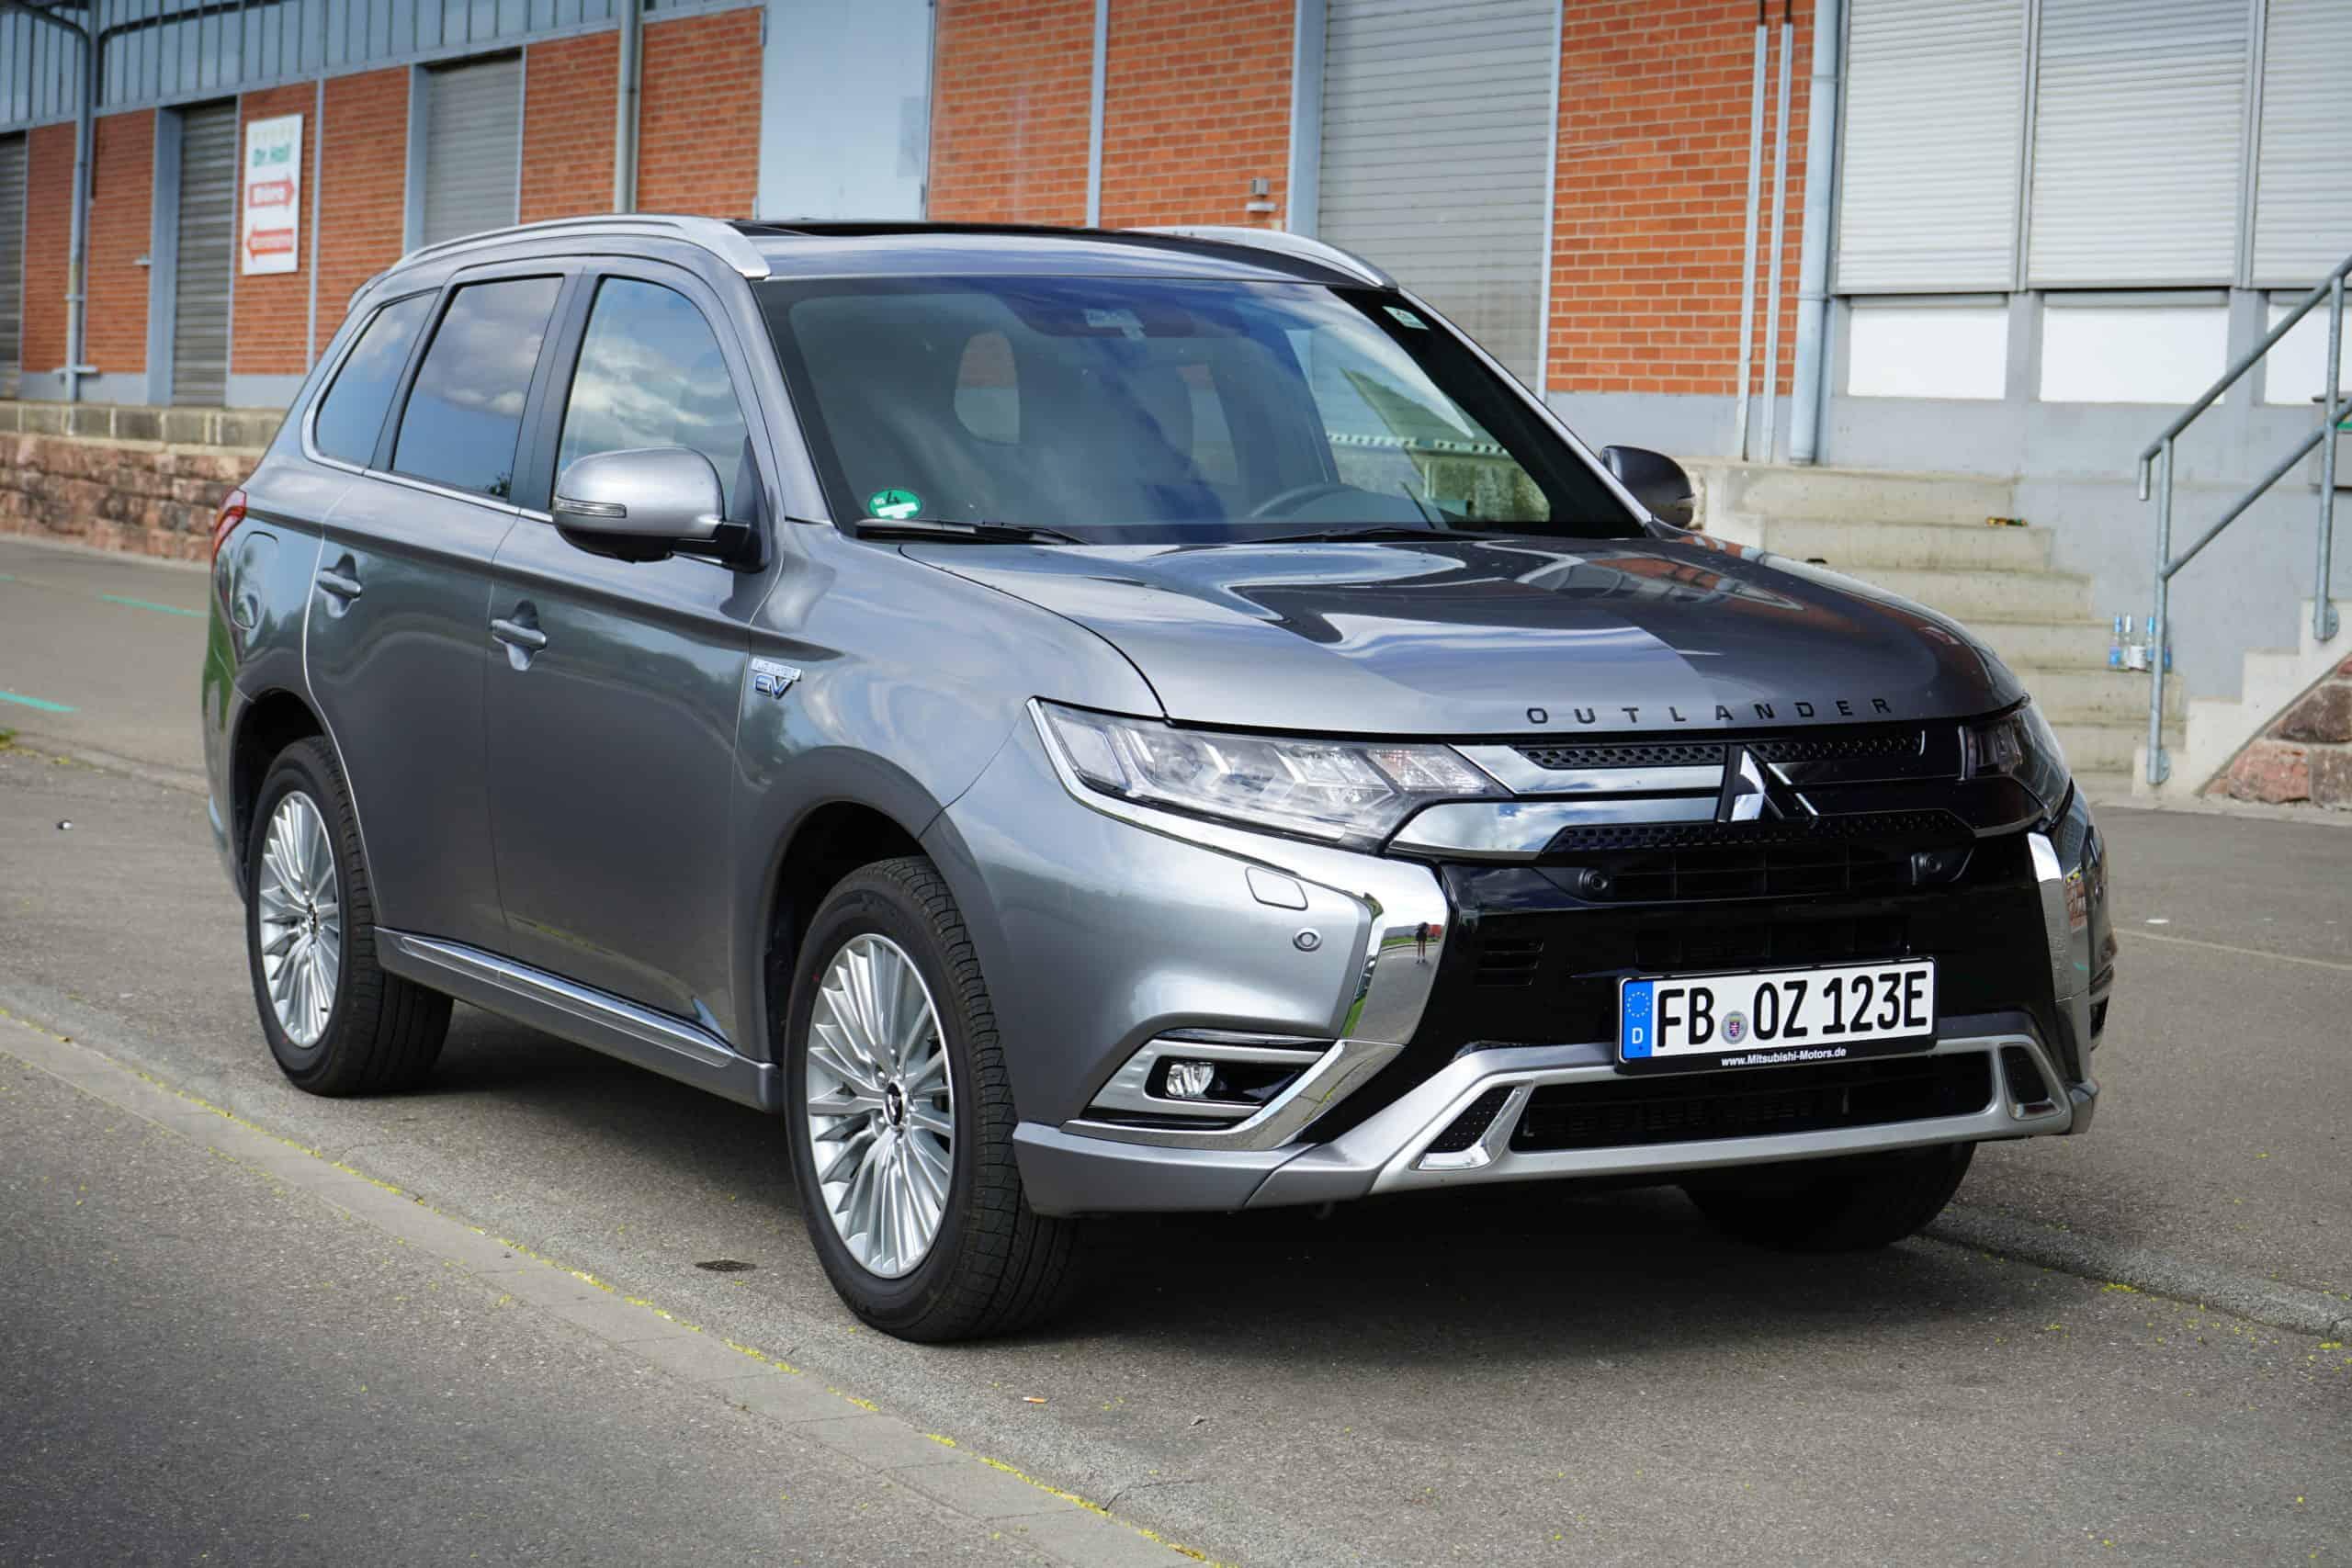 2020 Mitsubishi Outlander Price, Design and Review